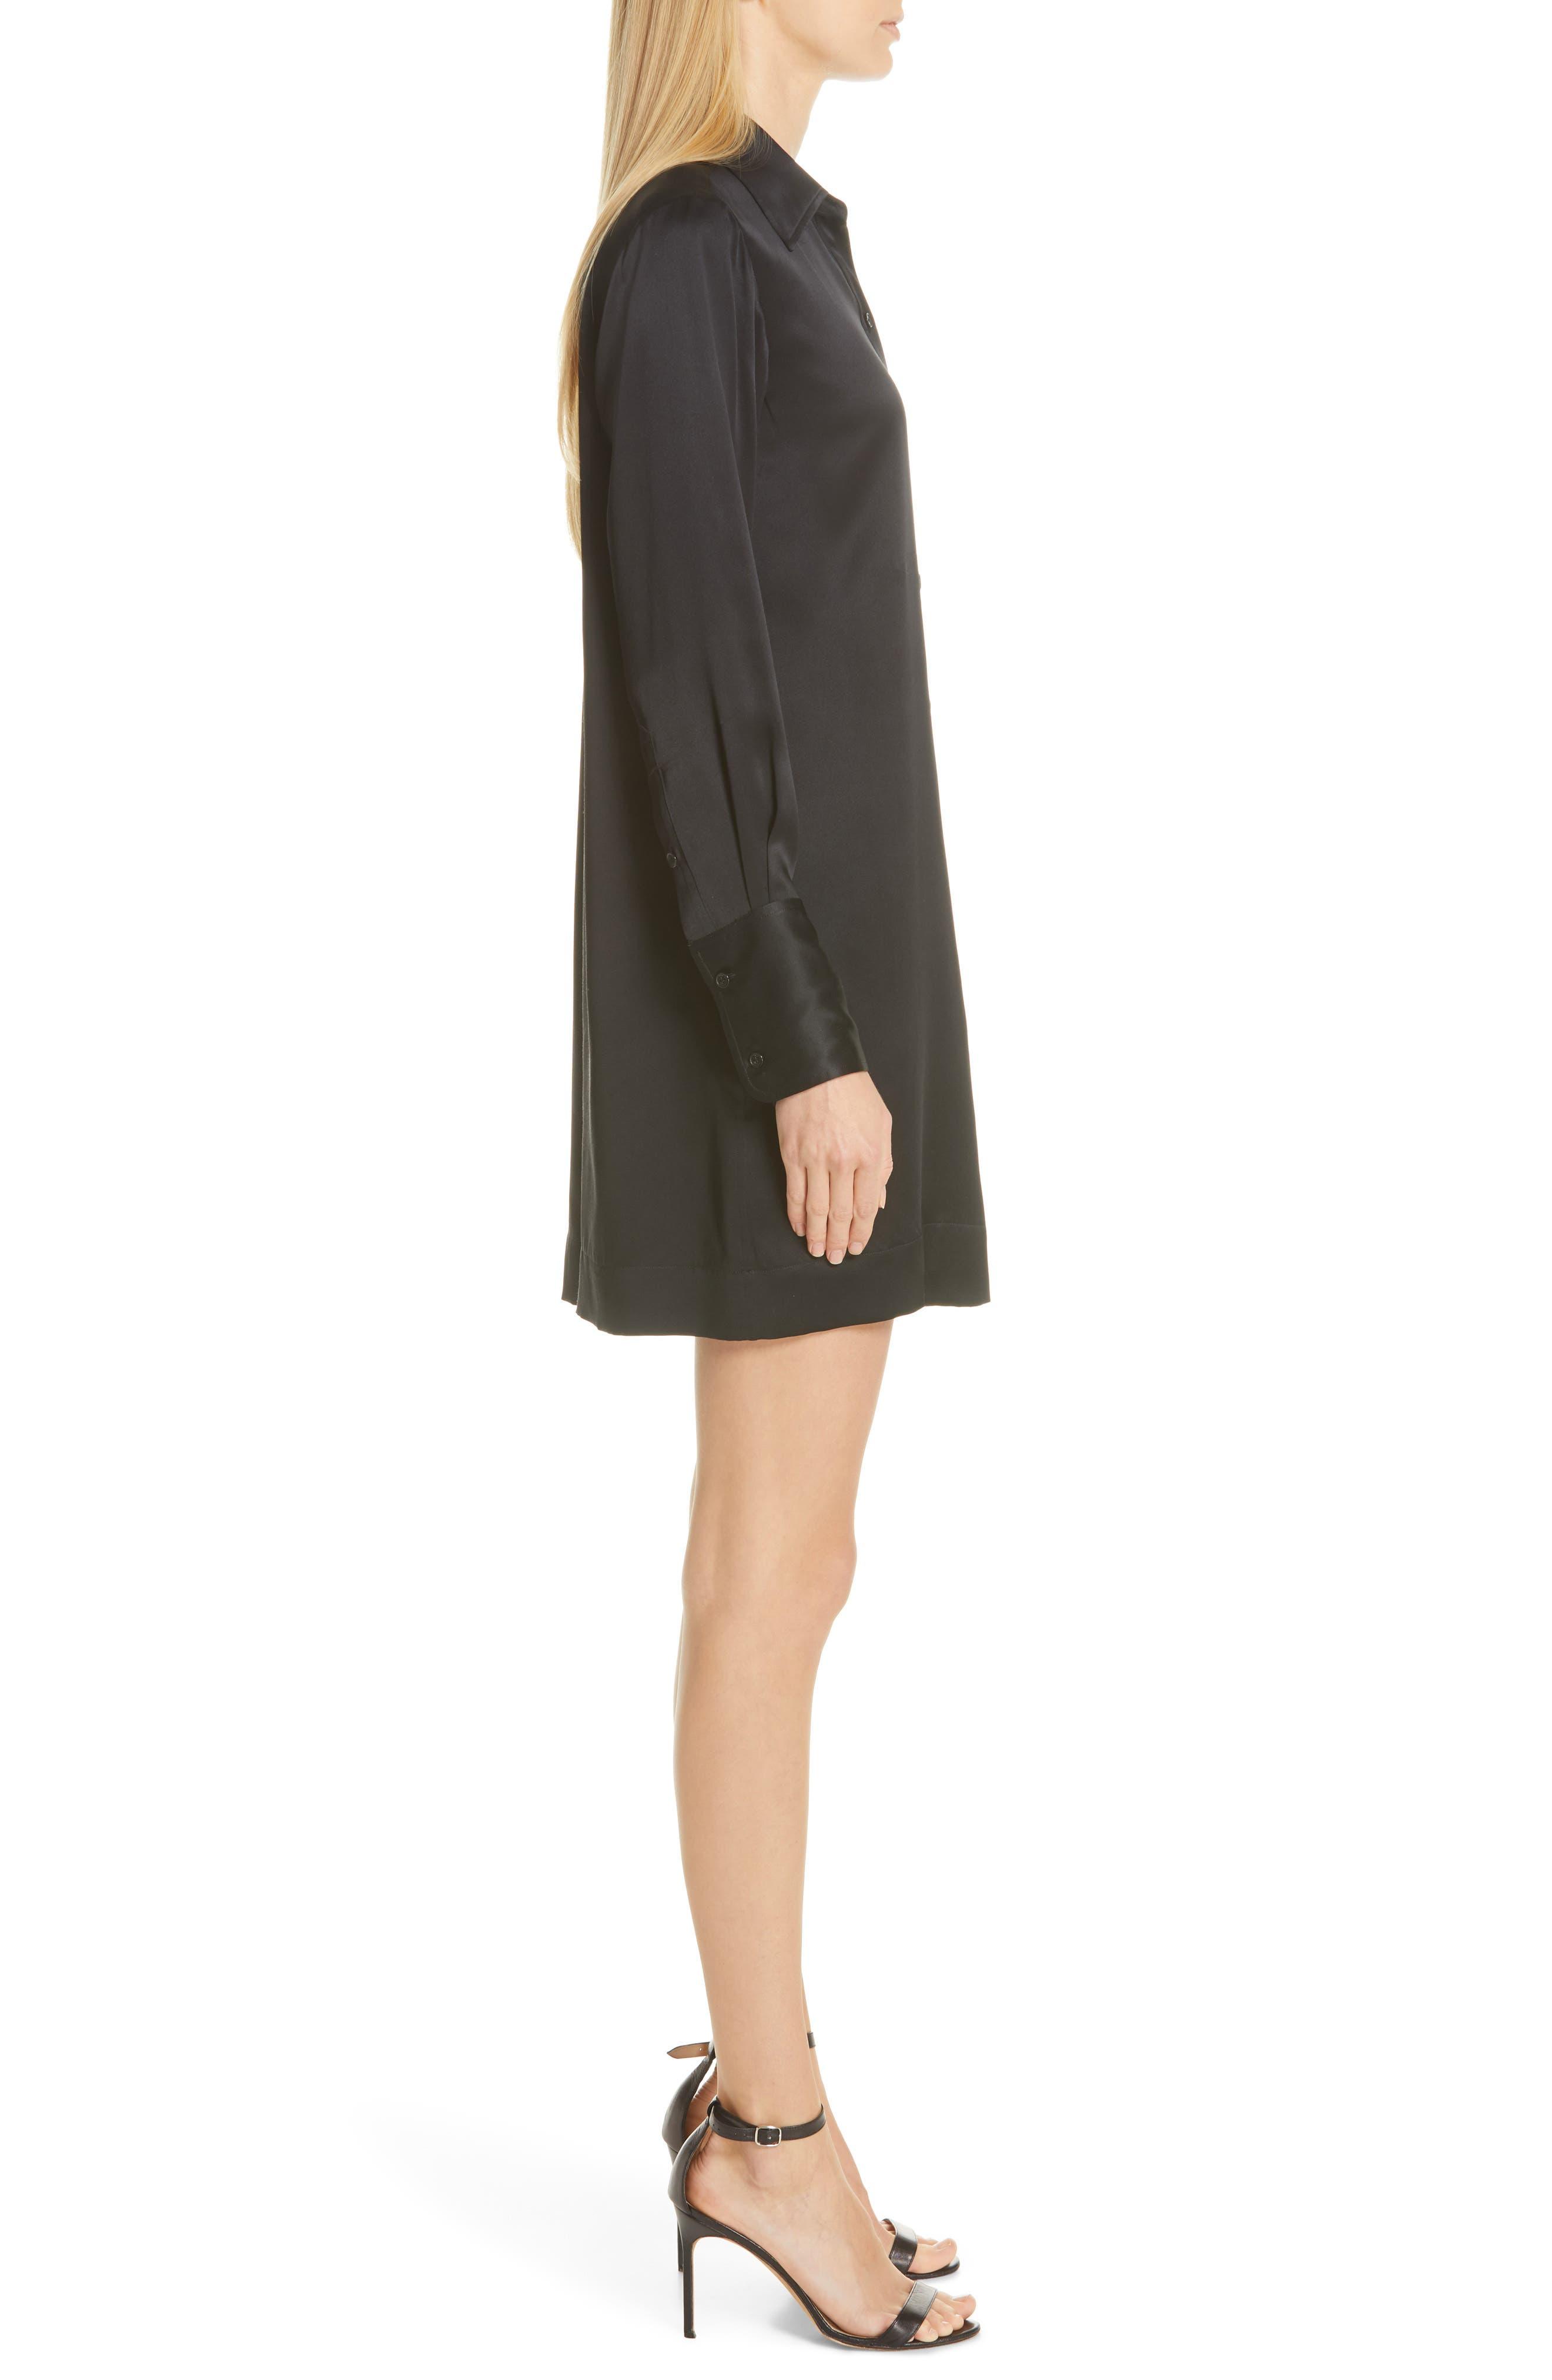 NILI LOTAN, Cassidy Silk Shirtdress, Alternate thumbnail 4, color, BLACK